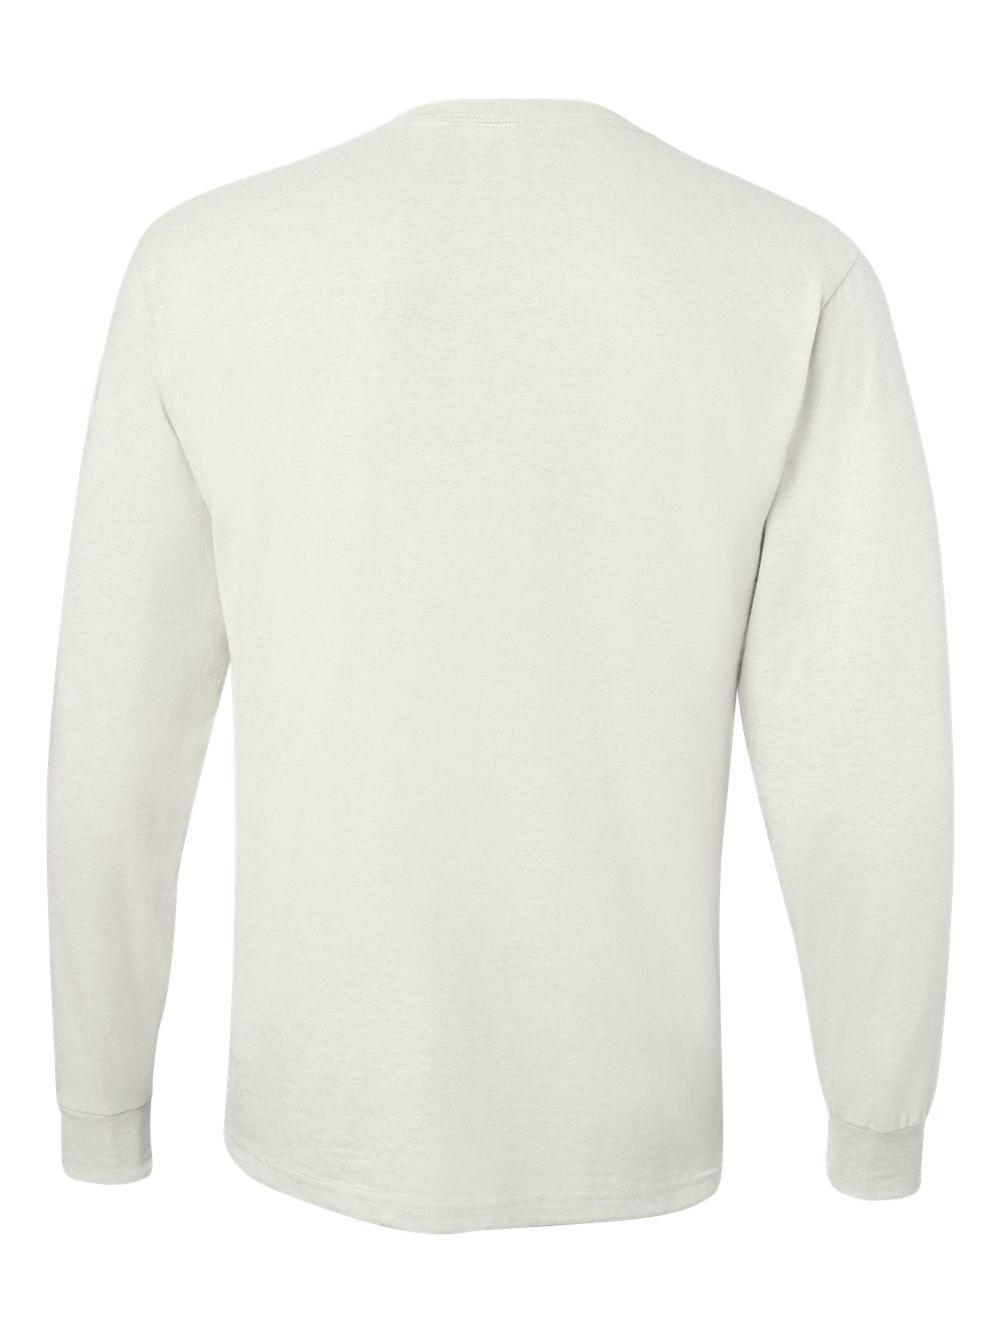 Jerzees-Dri-Power-Long-Sleeve-50-50-T-Shirt-29LSR thumbnail 91